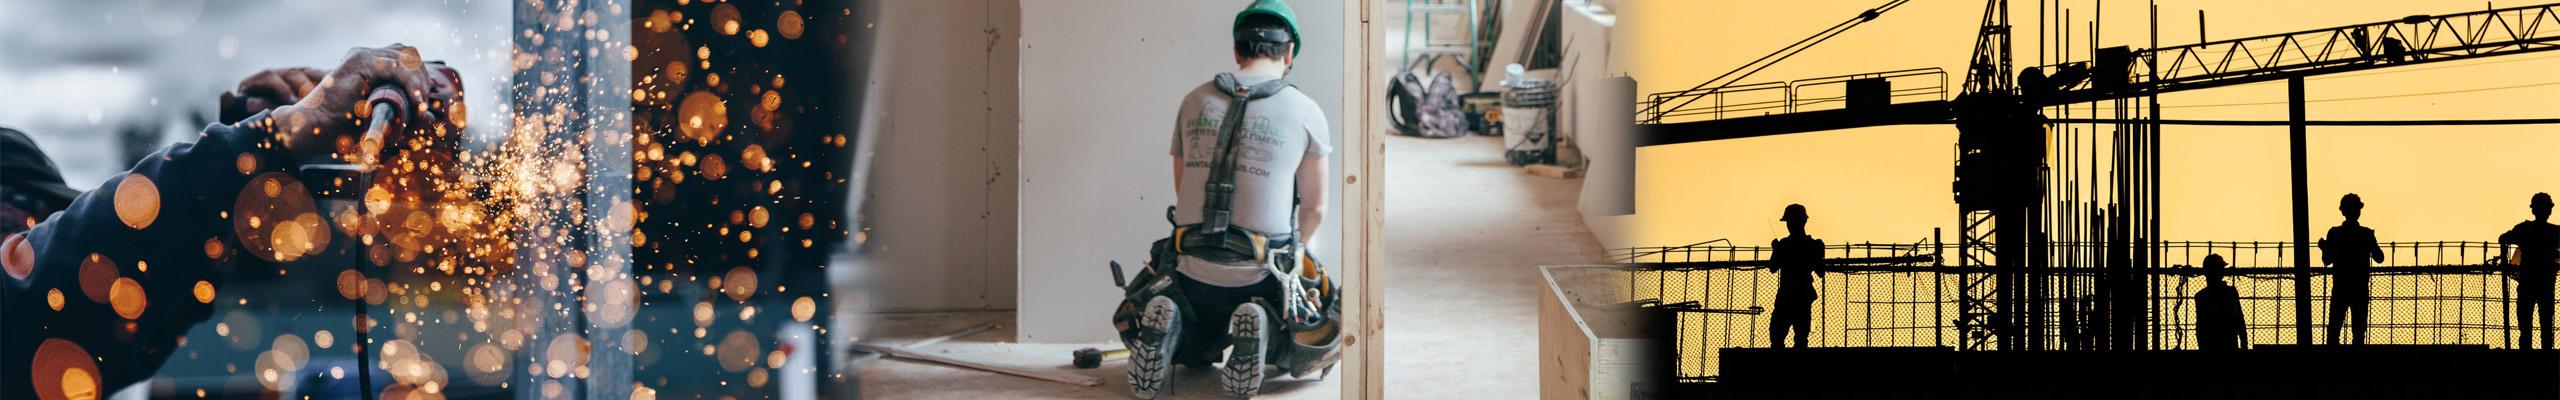 bouwbedrijf sleenhoff banner